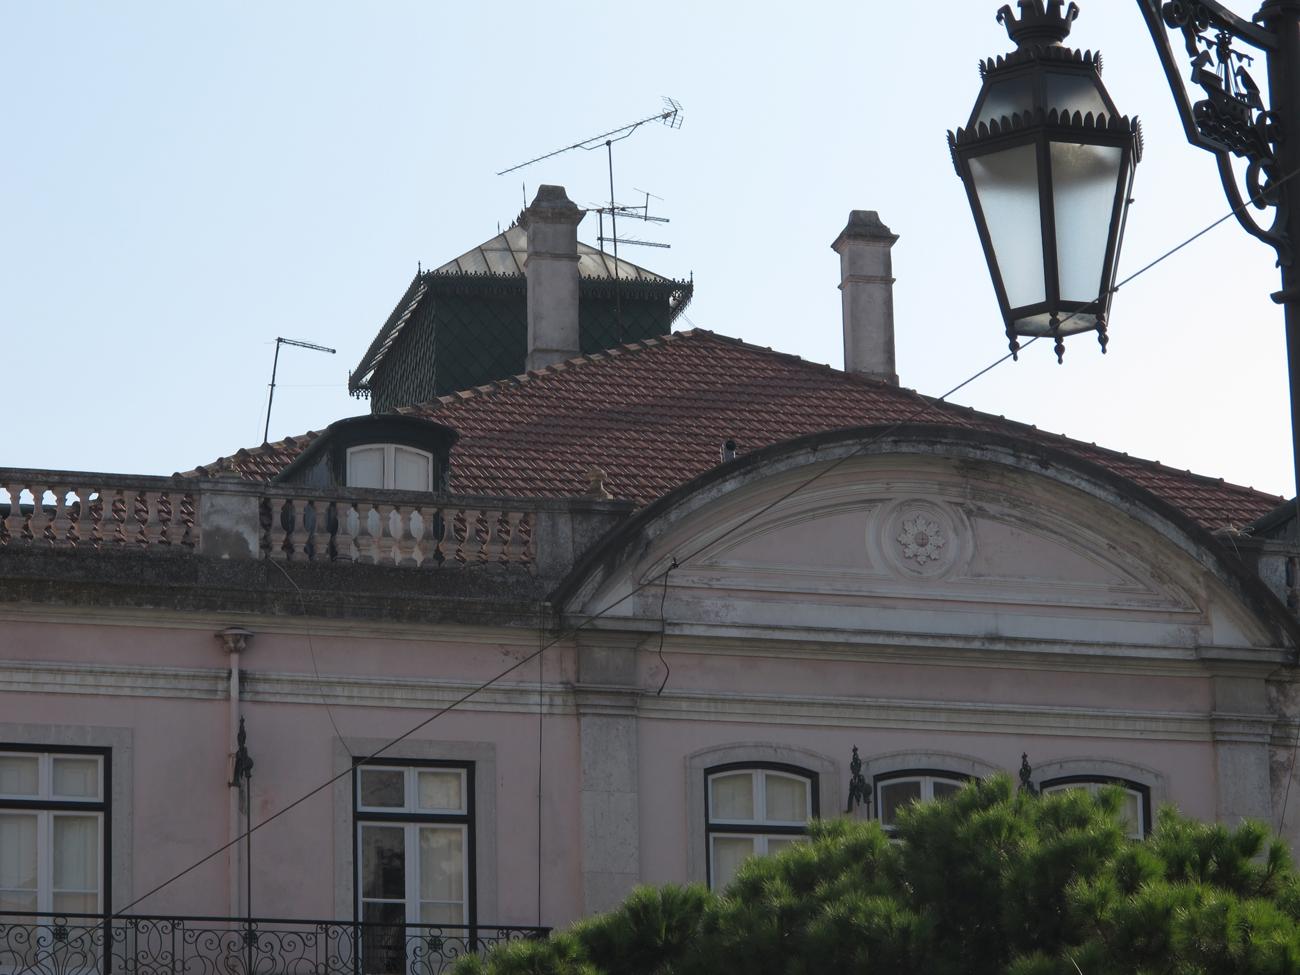 periscope visible above building facade